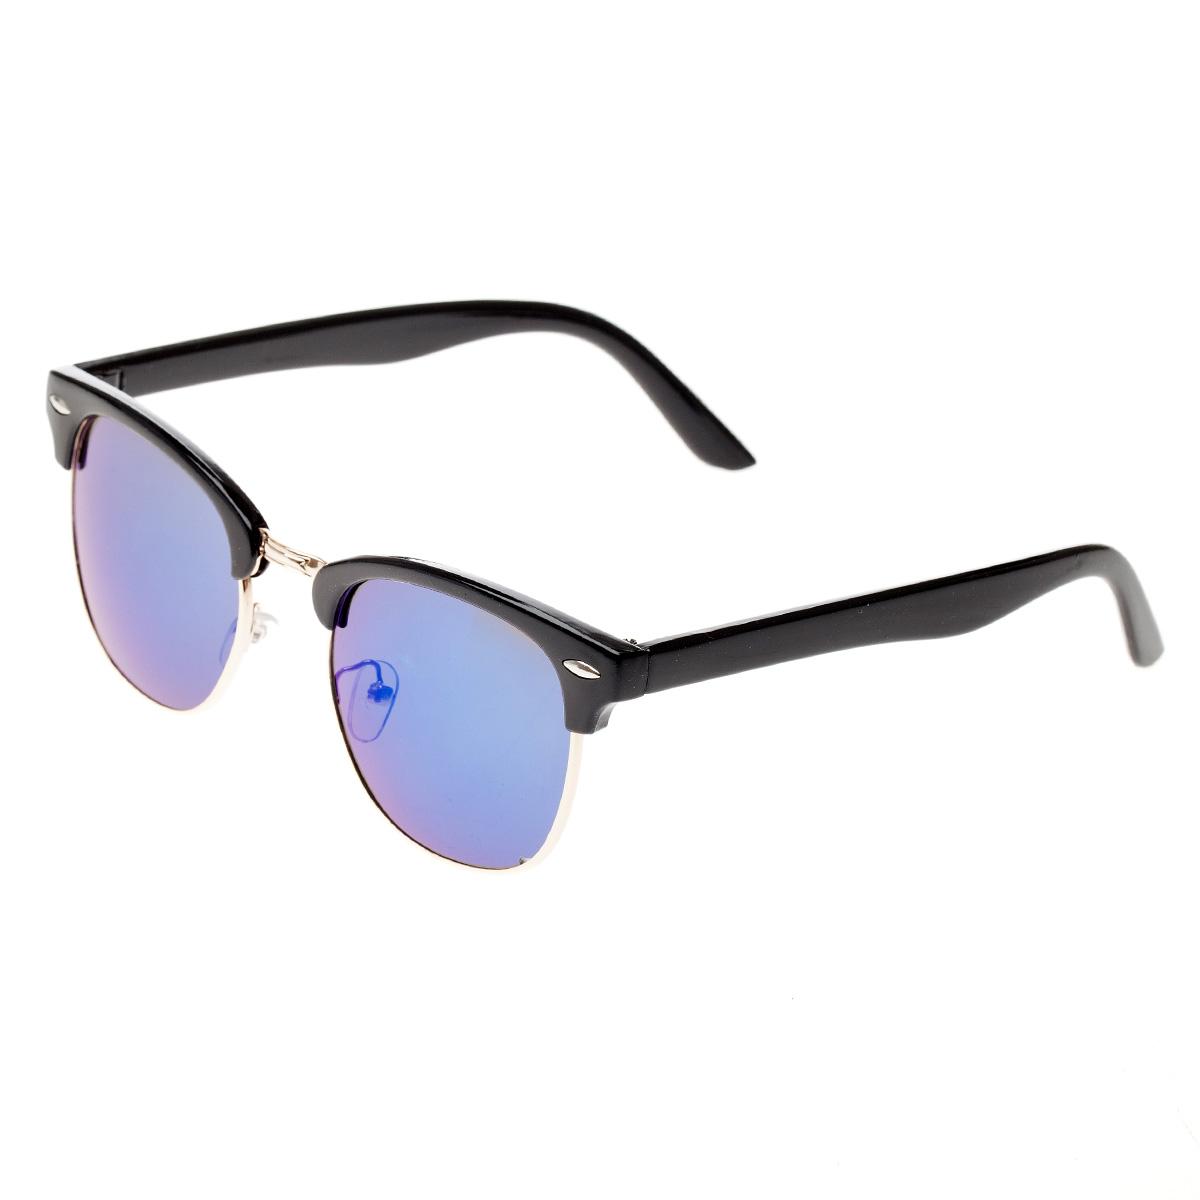 Фото - Очки солнцезащитные Sevenext, 23032-61 очки солнцезащитные sevenext 23032 28